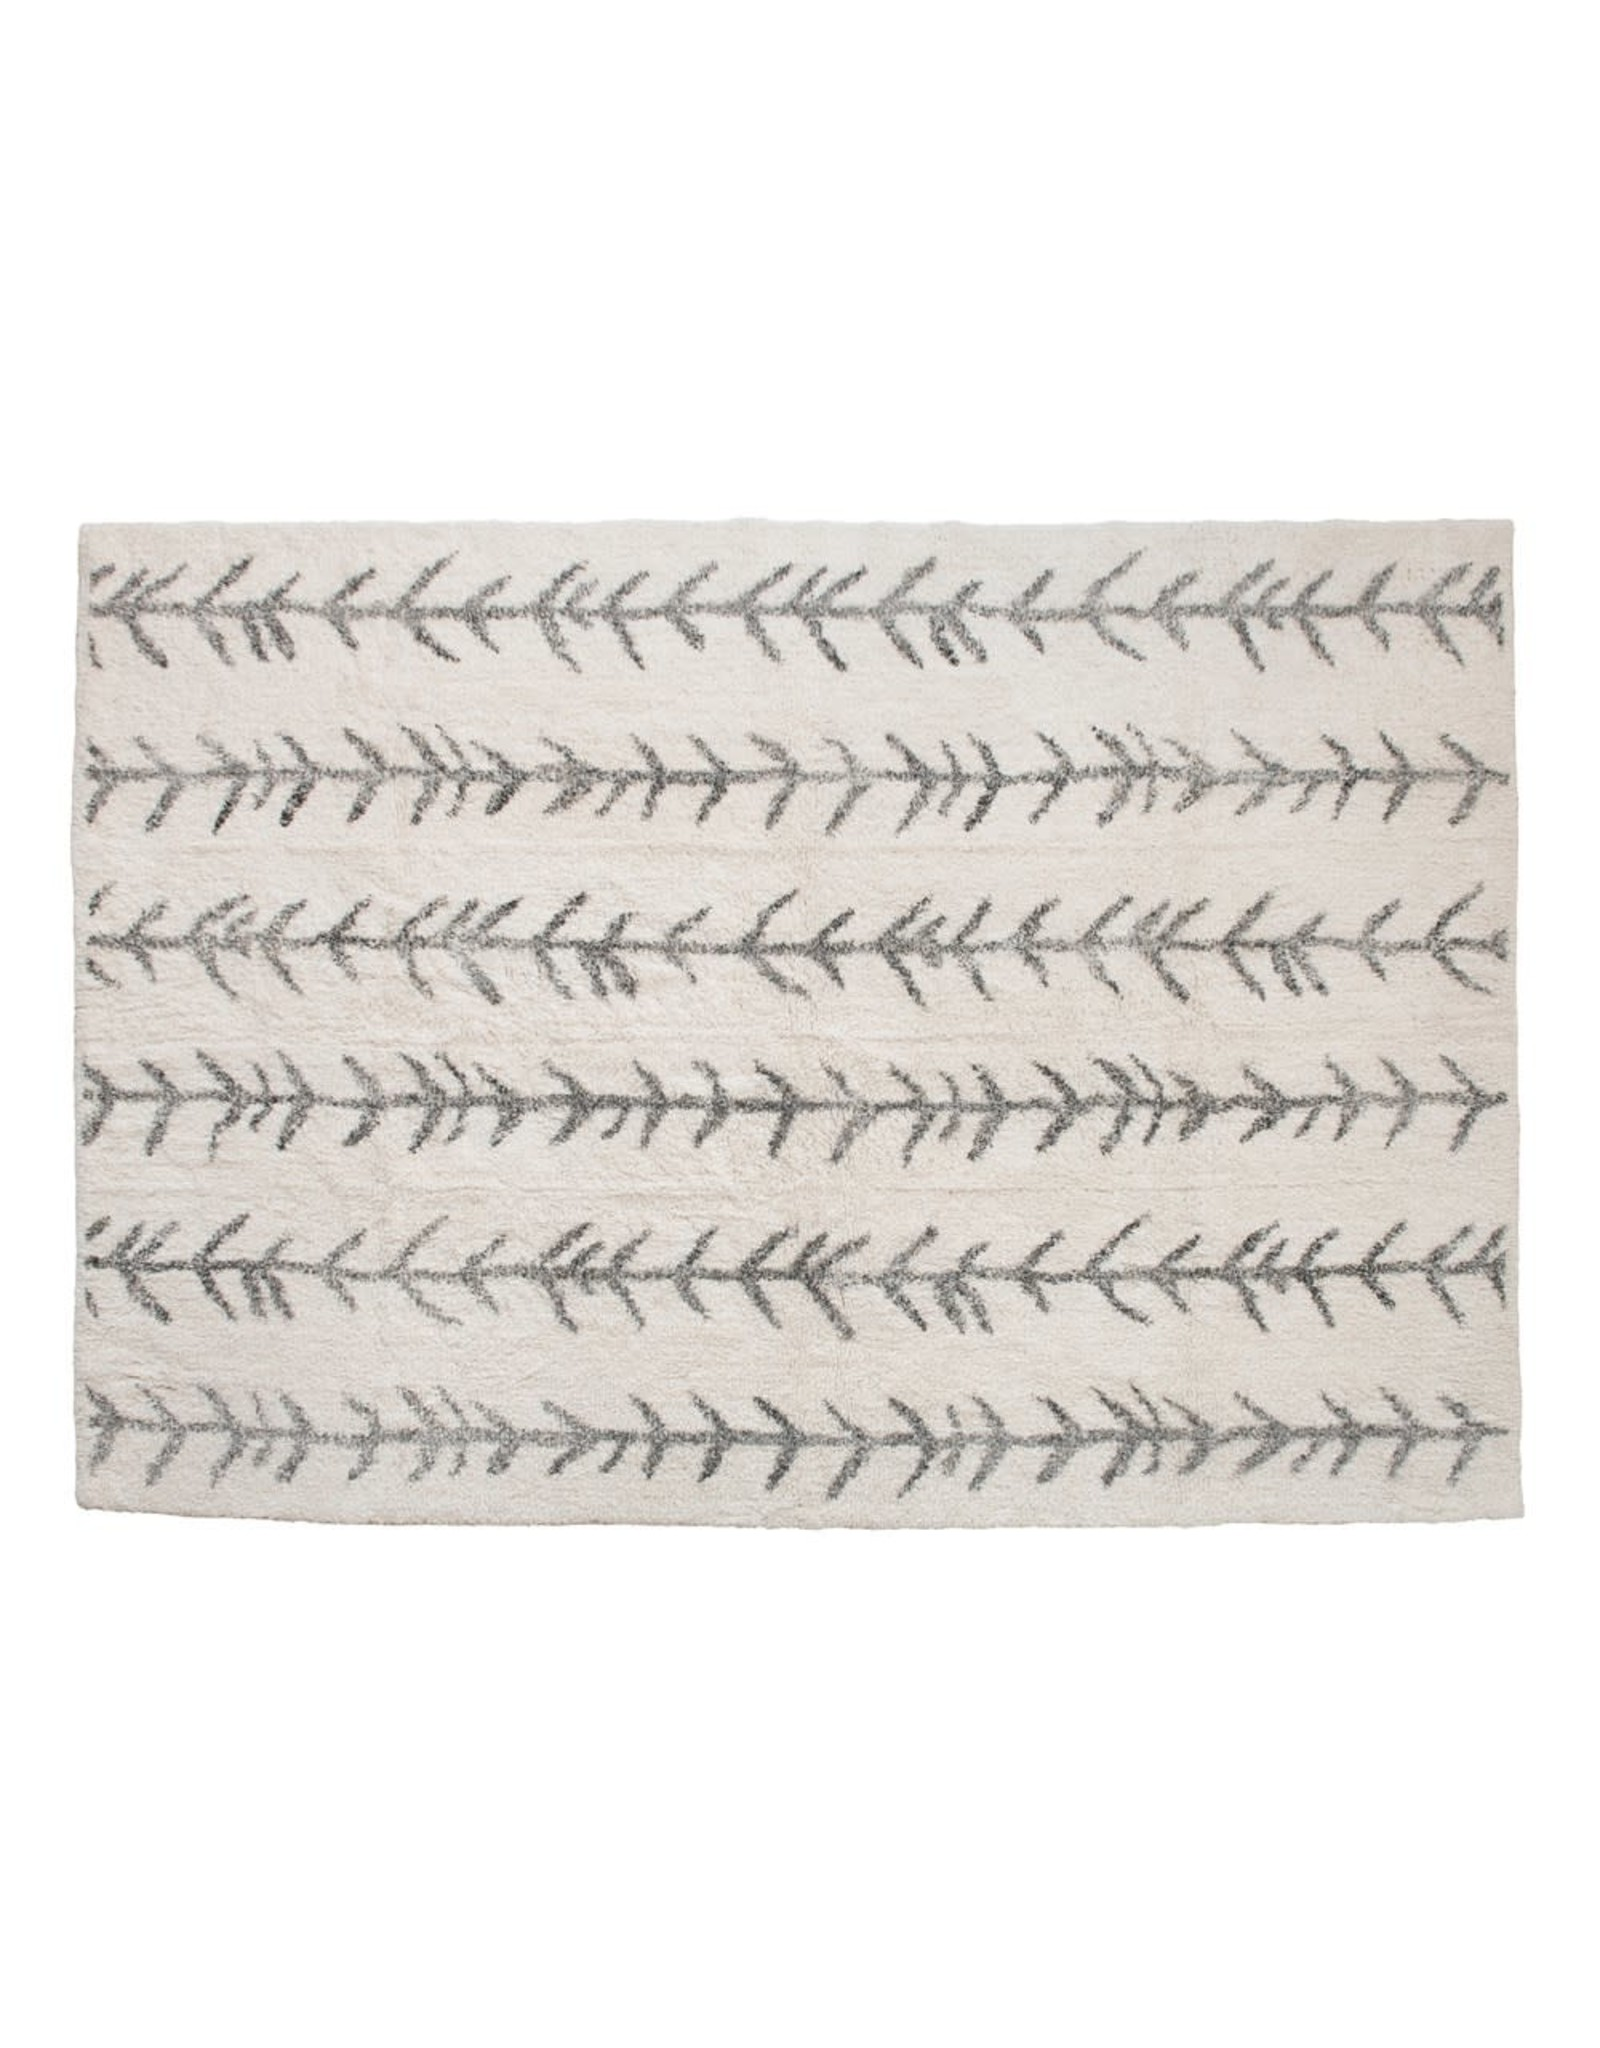 Creative Co-op 5' x 7' Cotton Tufted Rug, Cream w/ Arrow Lines